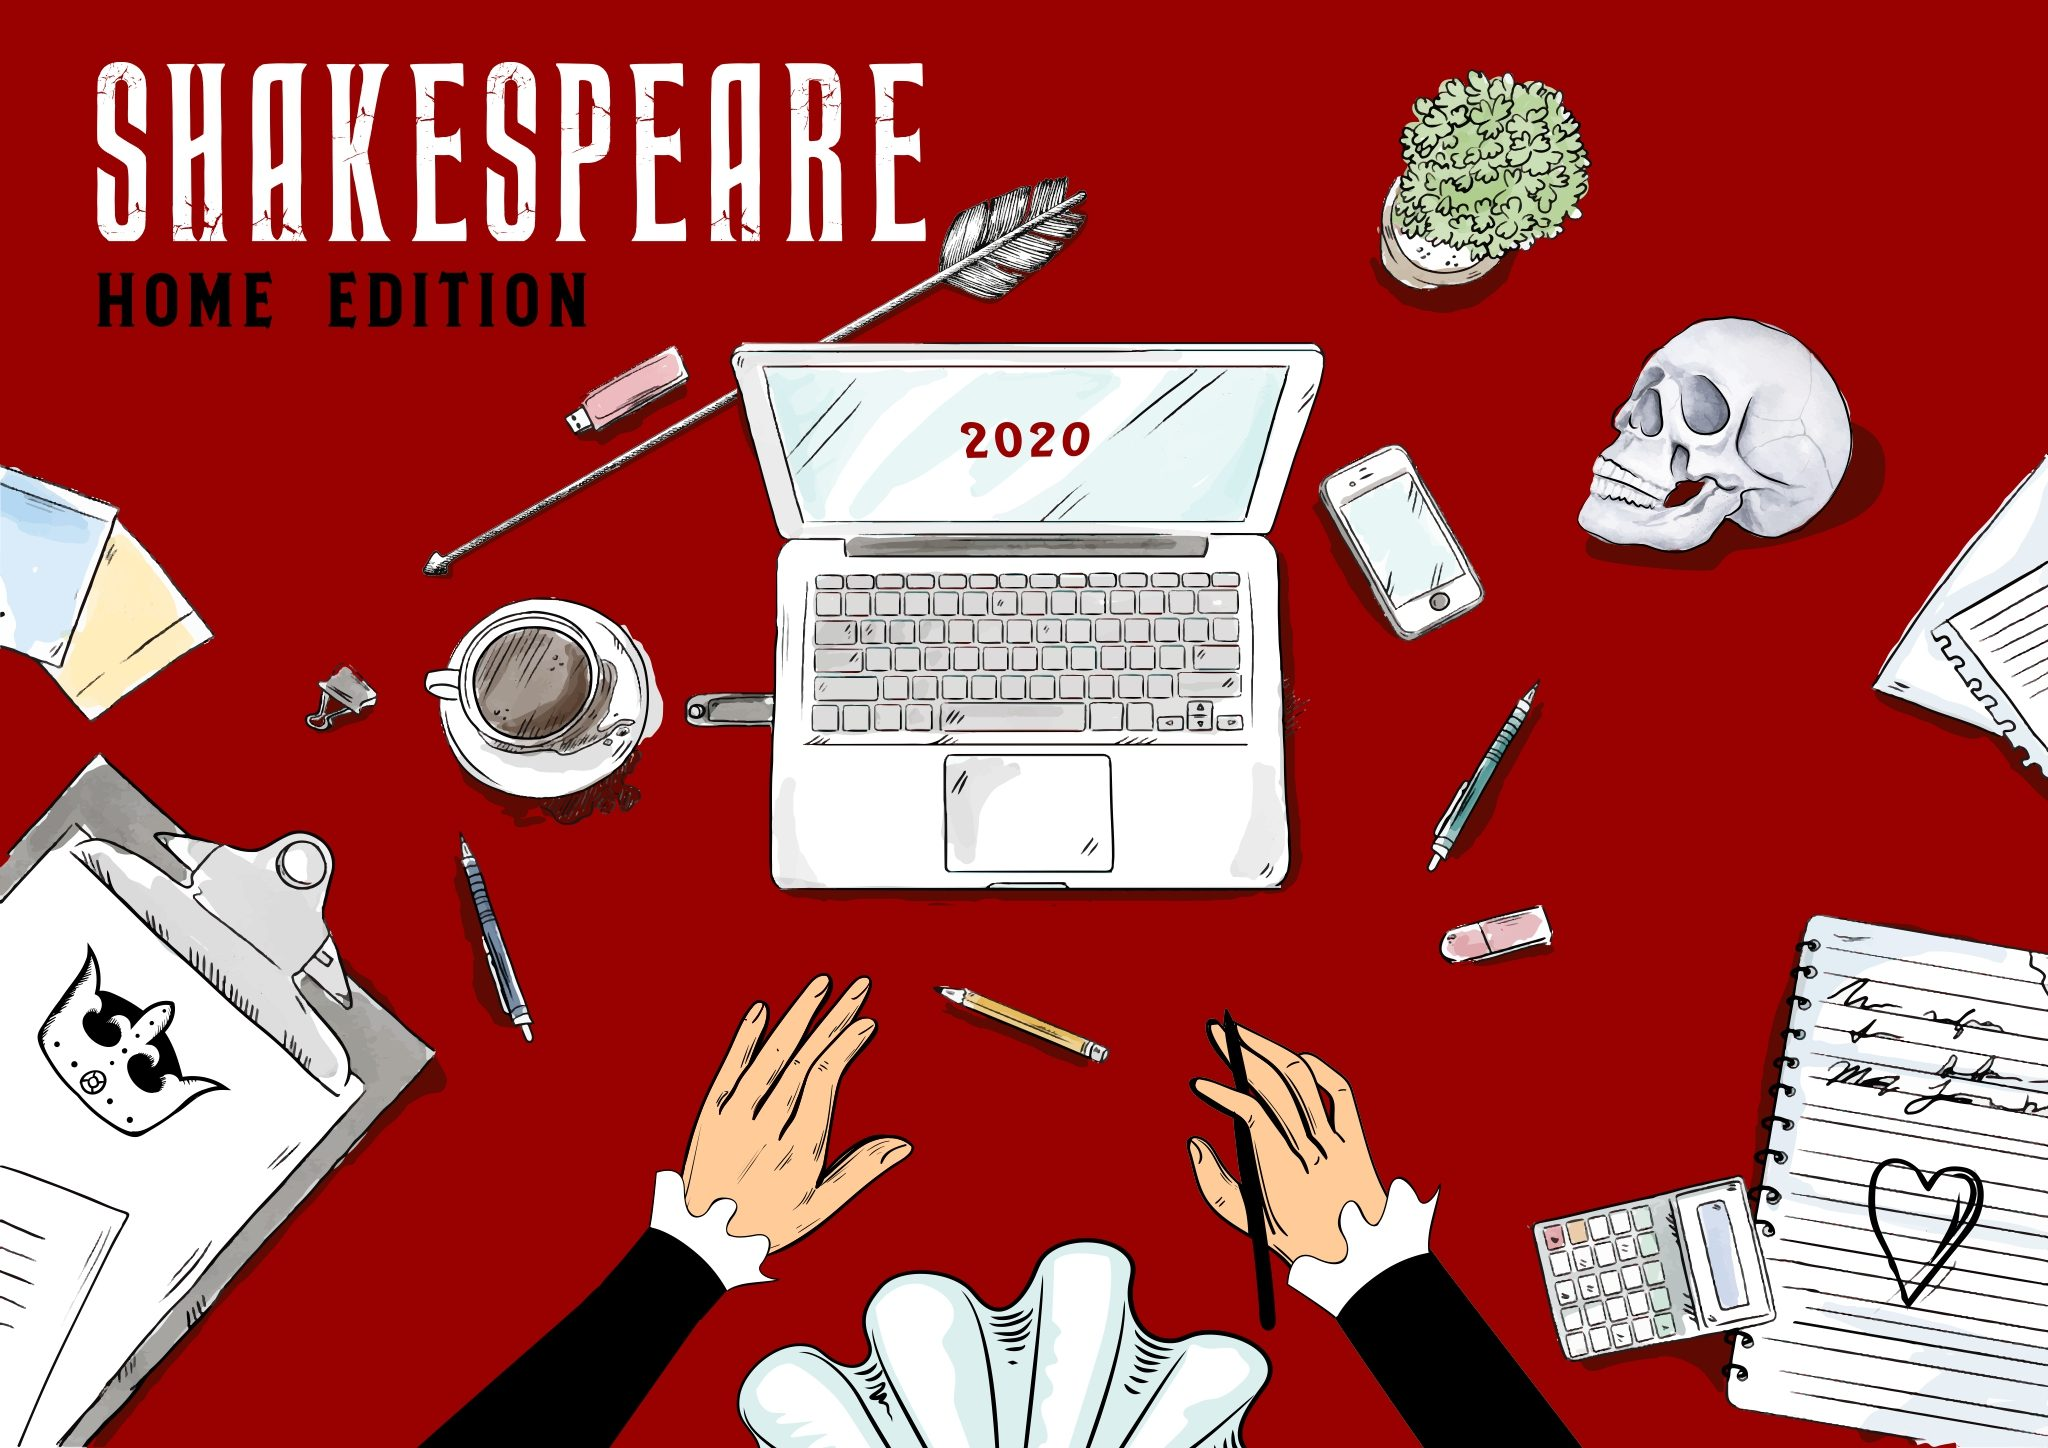 festivalul shakespeare 2020